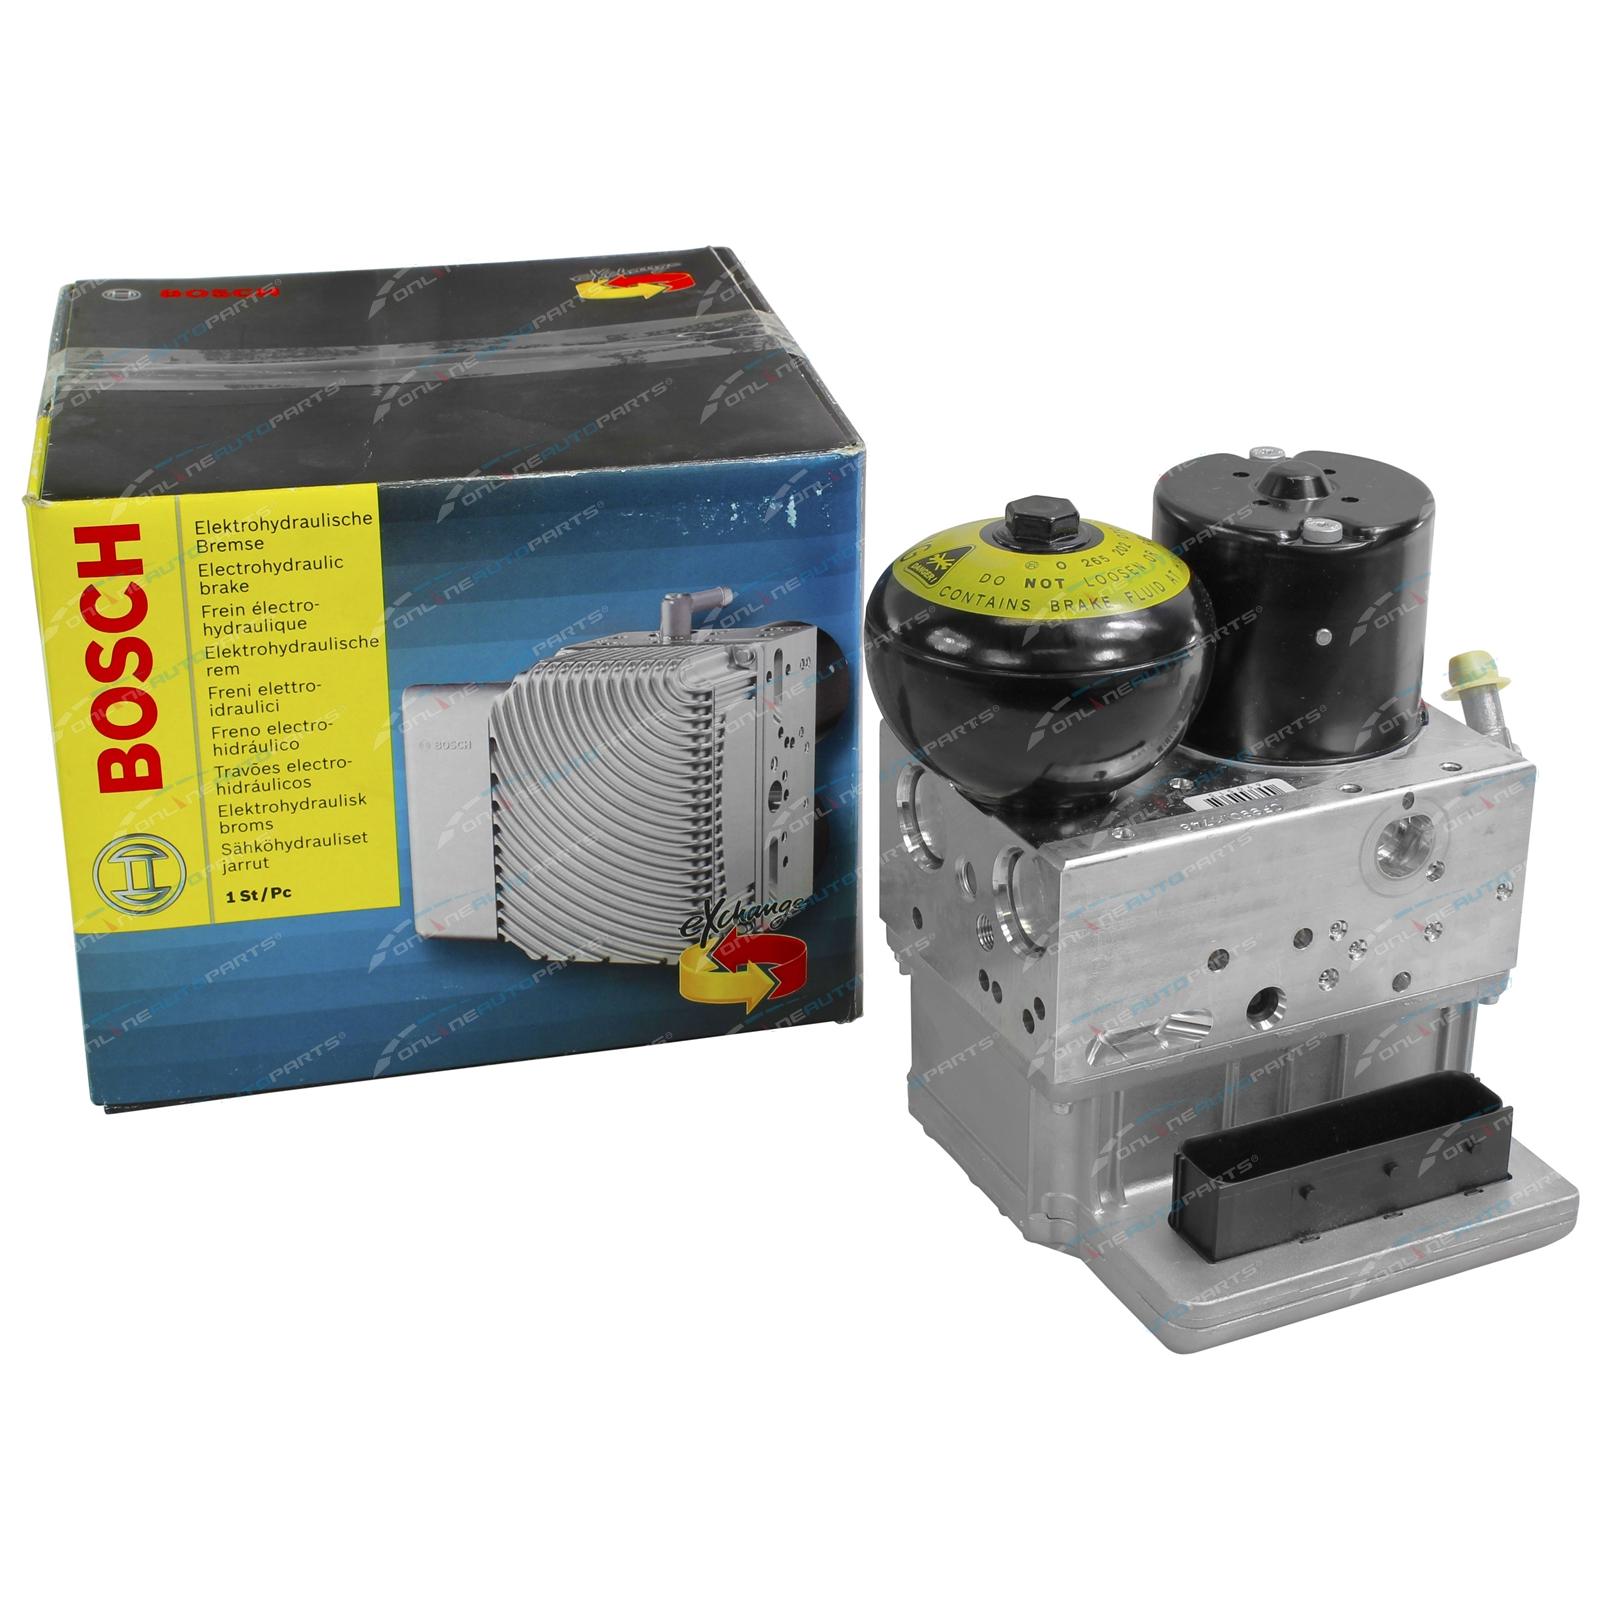 Genuine Bosch Hydraulic Brake Accumulator Unit Brake Booster